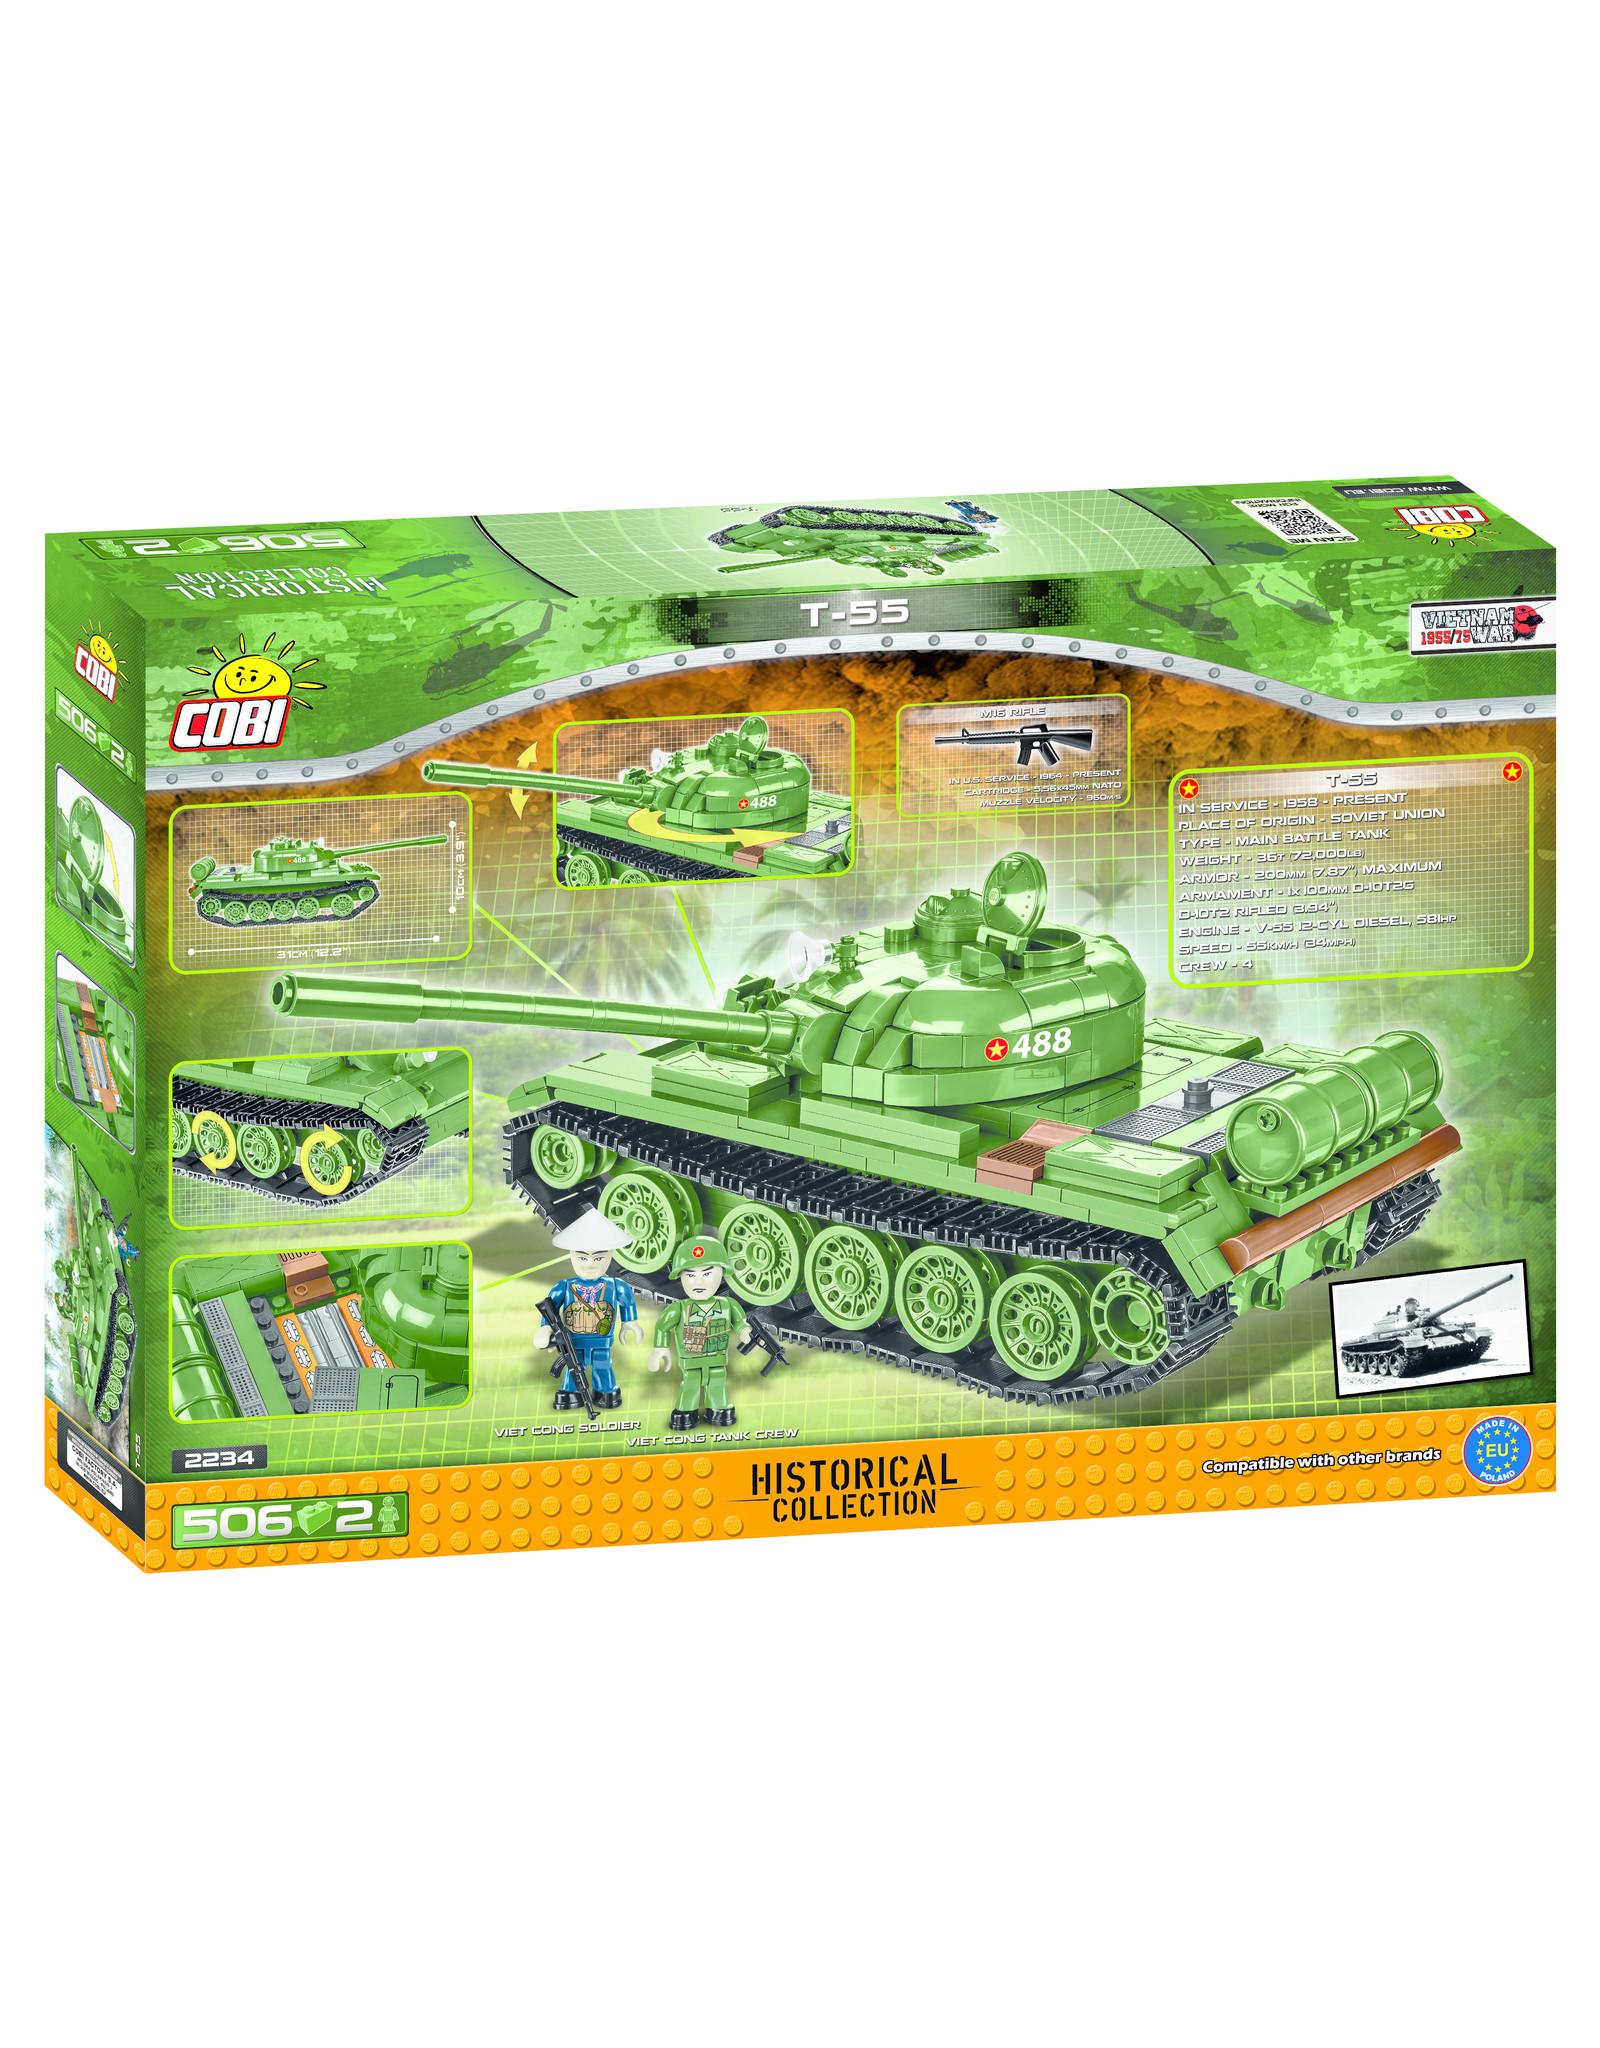 COBI COBI 2234 T-55 Vietnam War